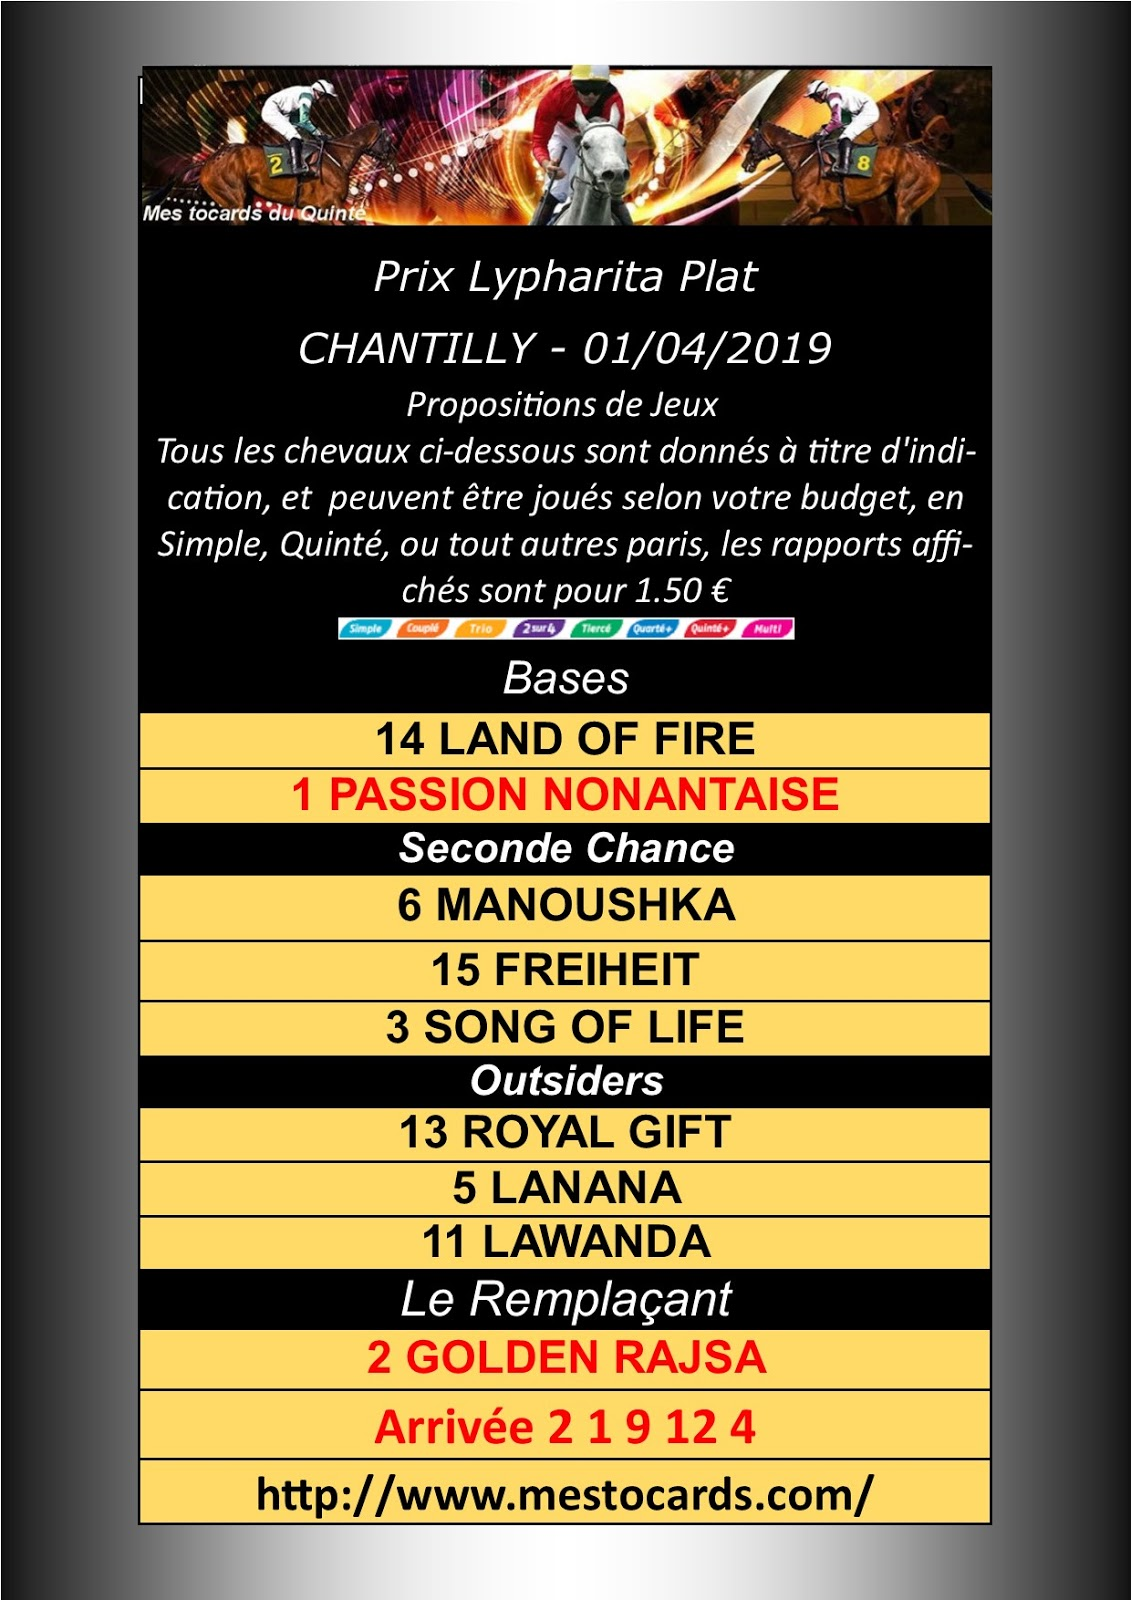 Quinté Prix Lypharita Plat - CHANTILLY - 01/04/2019 Mestocards